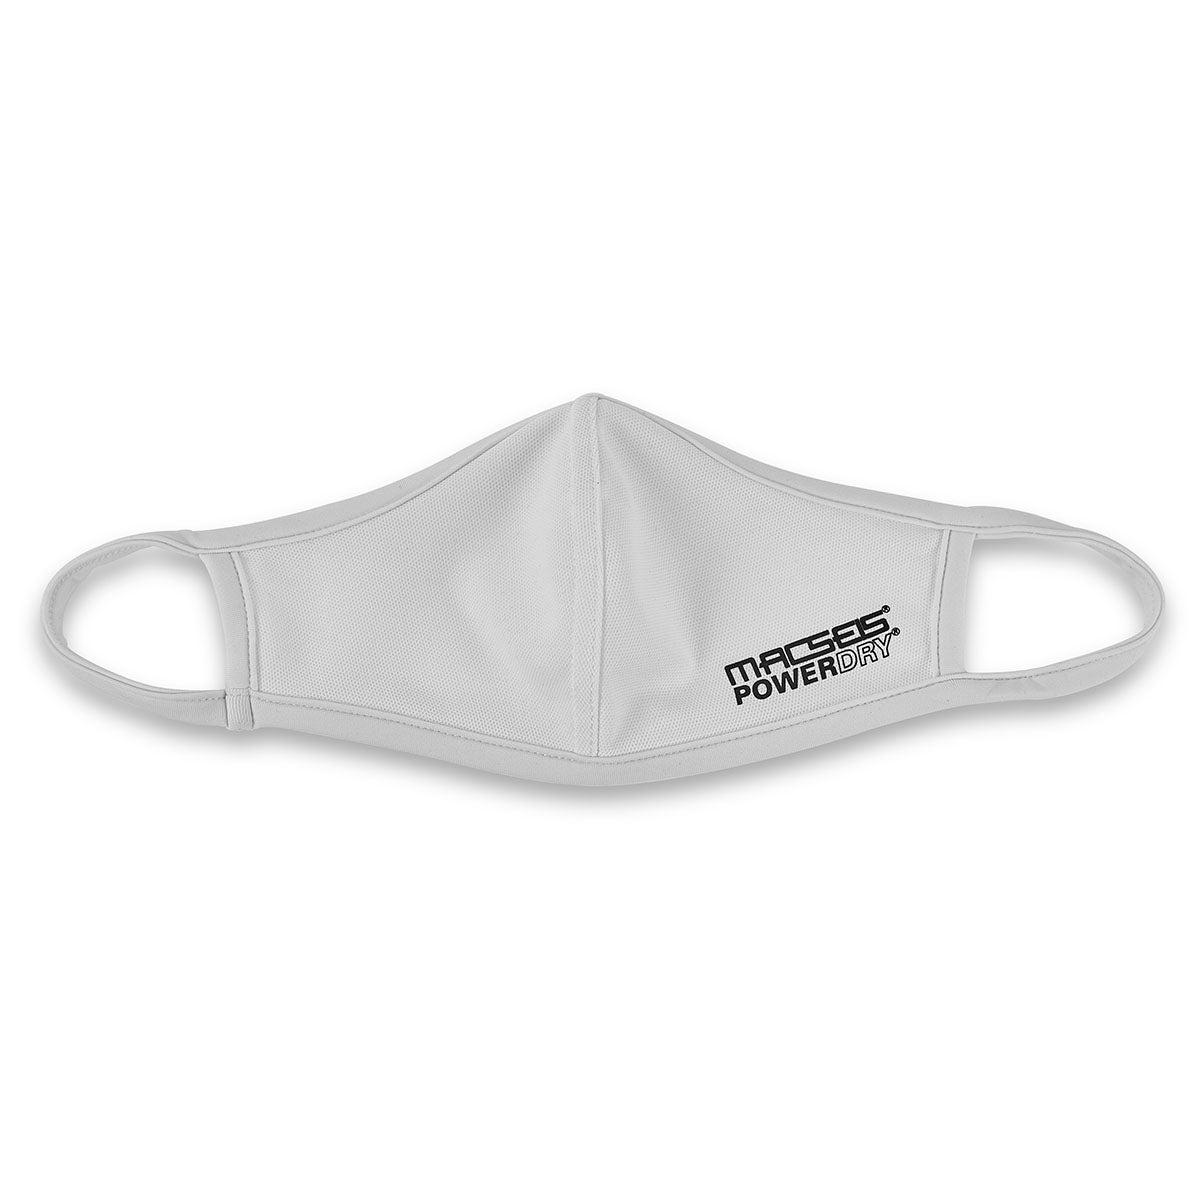 Unisex Macseis PowderDry Mask - White Small